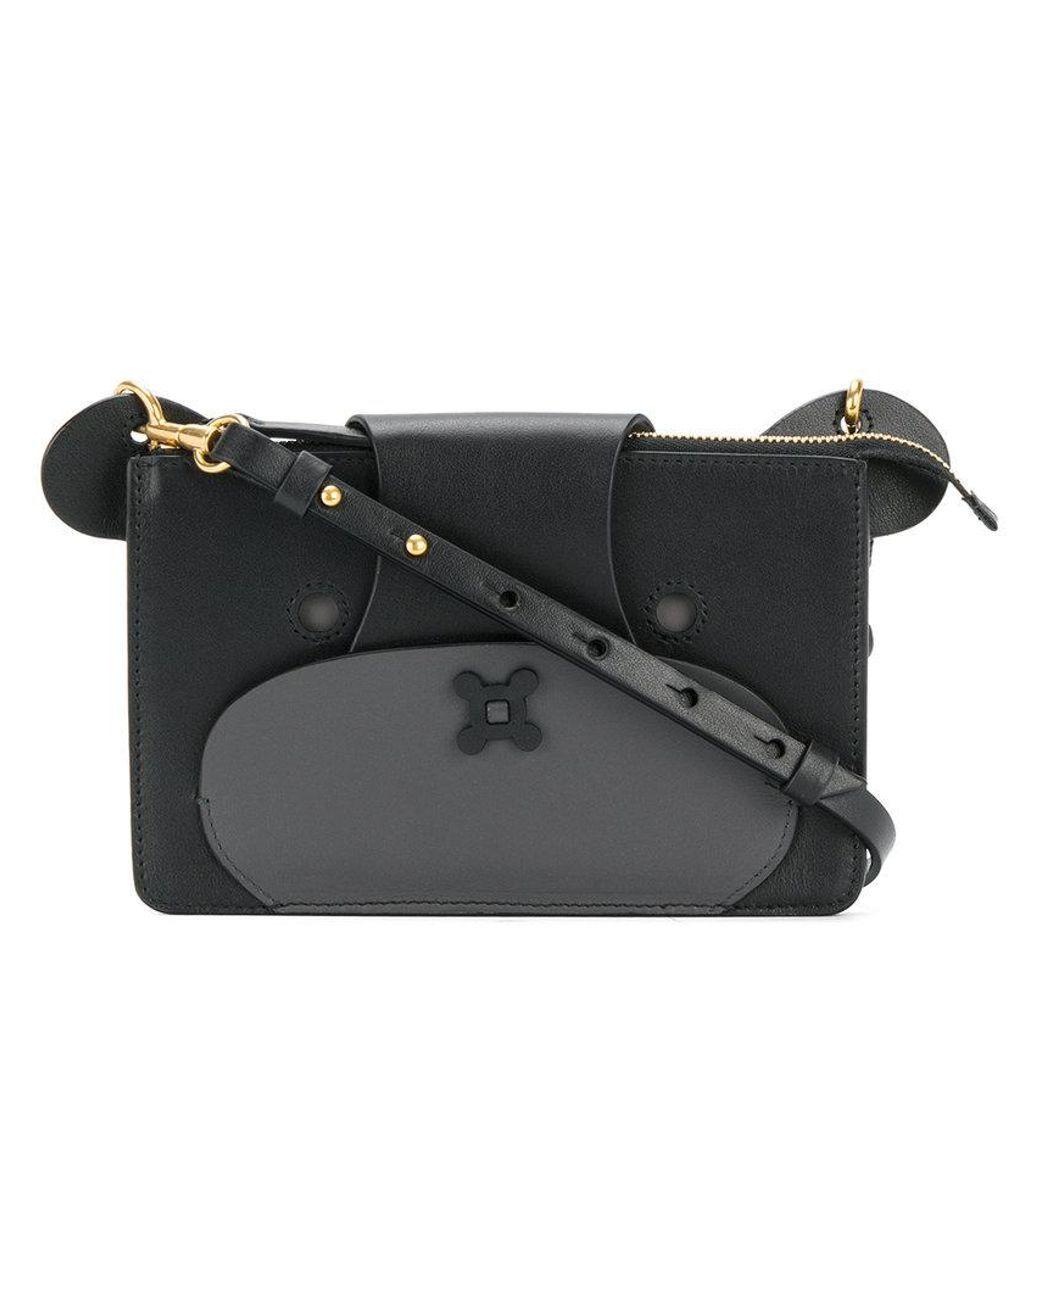 155284f1db84 Women's Black Bear Cross-body Bag   Shaped Bags   Crossbody bag ...